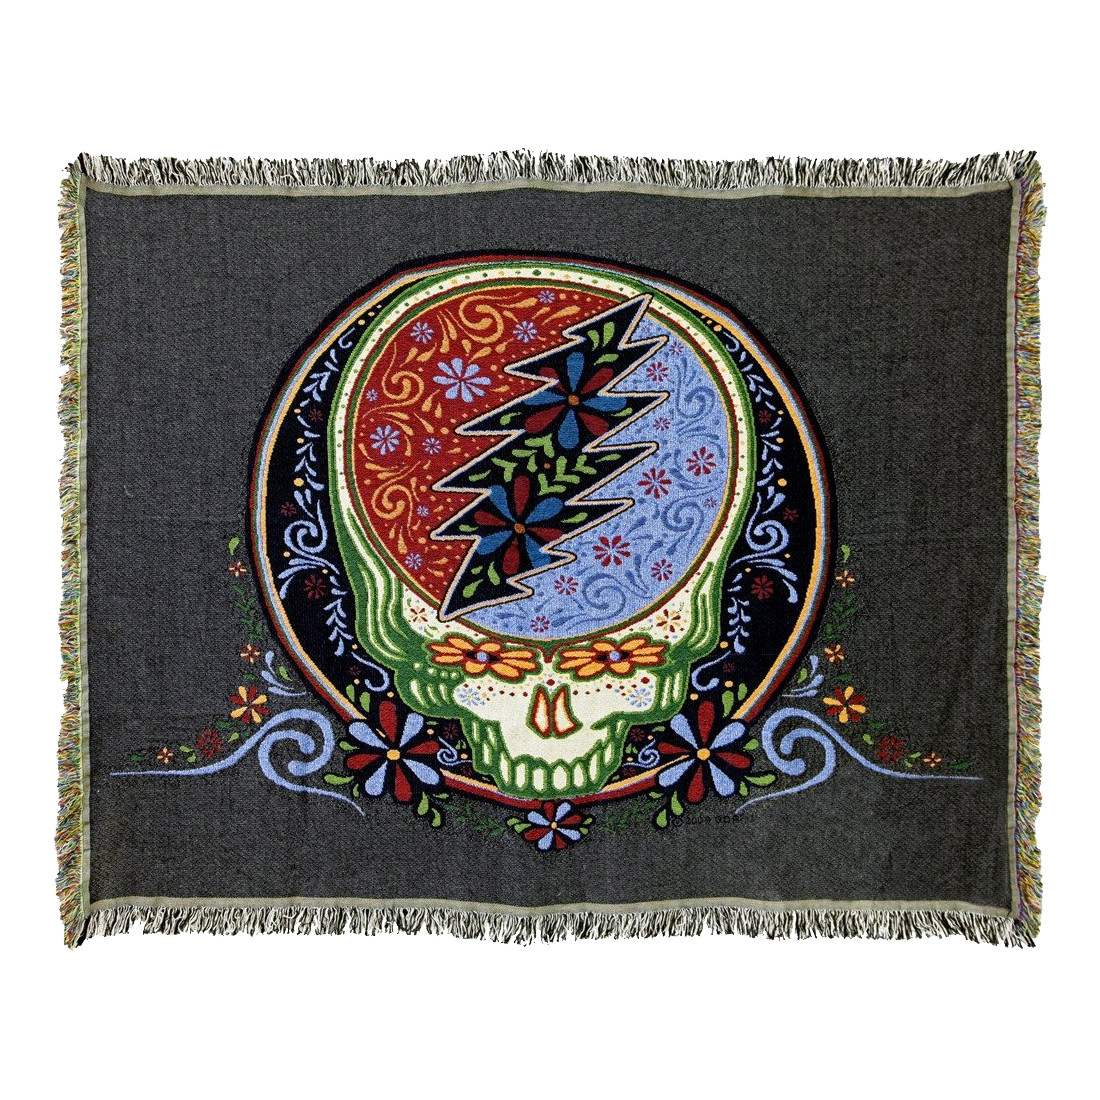 GD Calaveras Stealie Woven Blanket